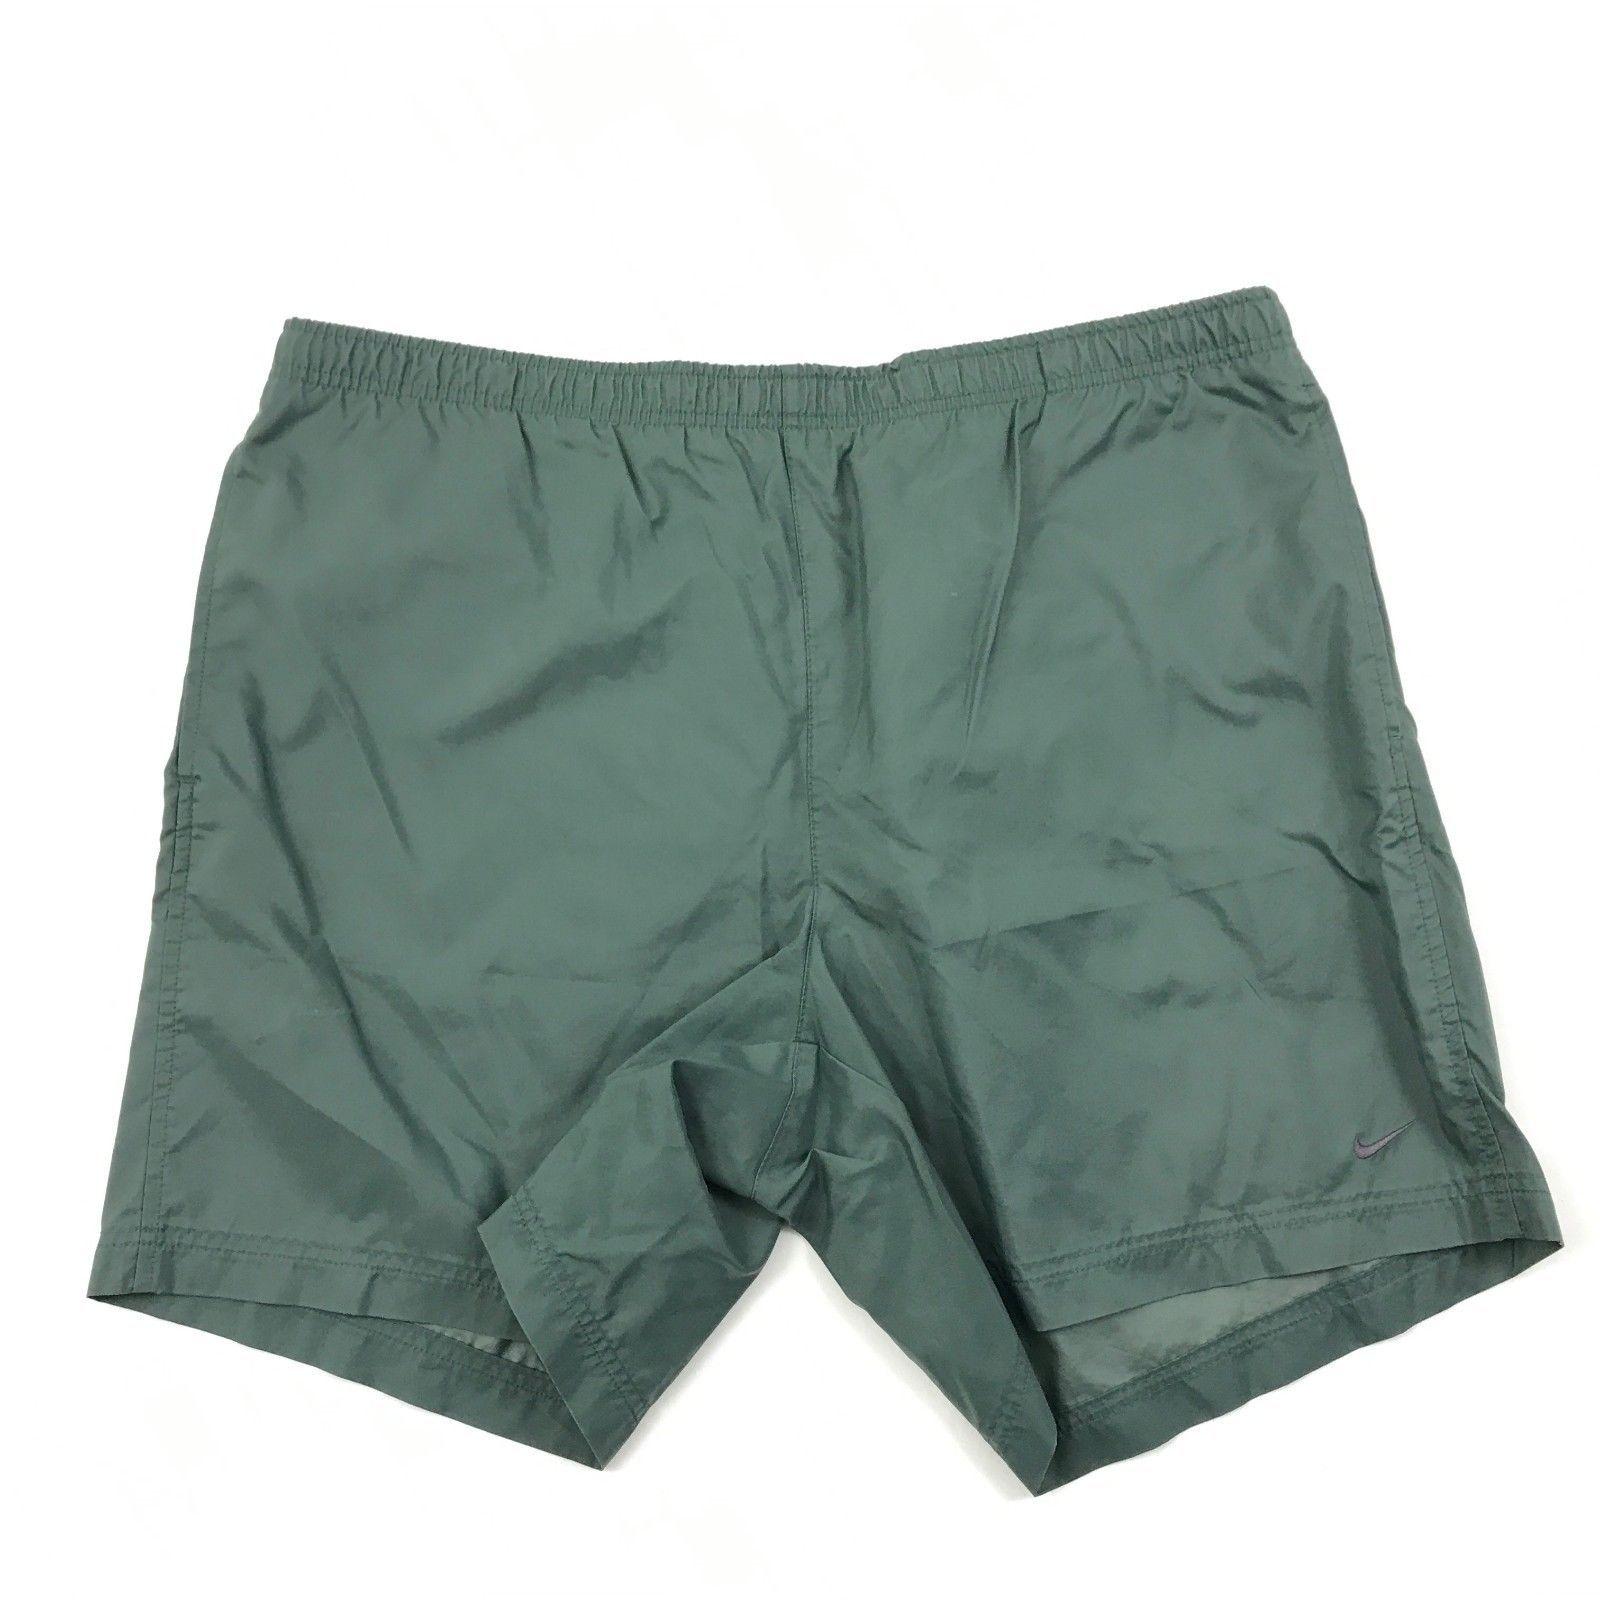 0c46fba2 Vintage Nike Shorts de Baño Hombre Nailon and similar items. 57